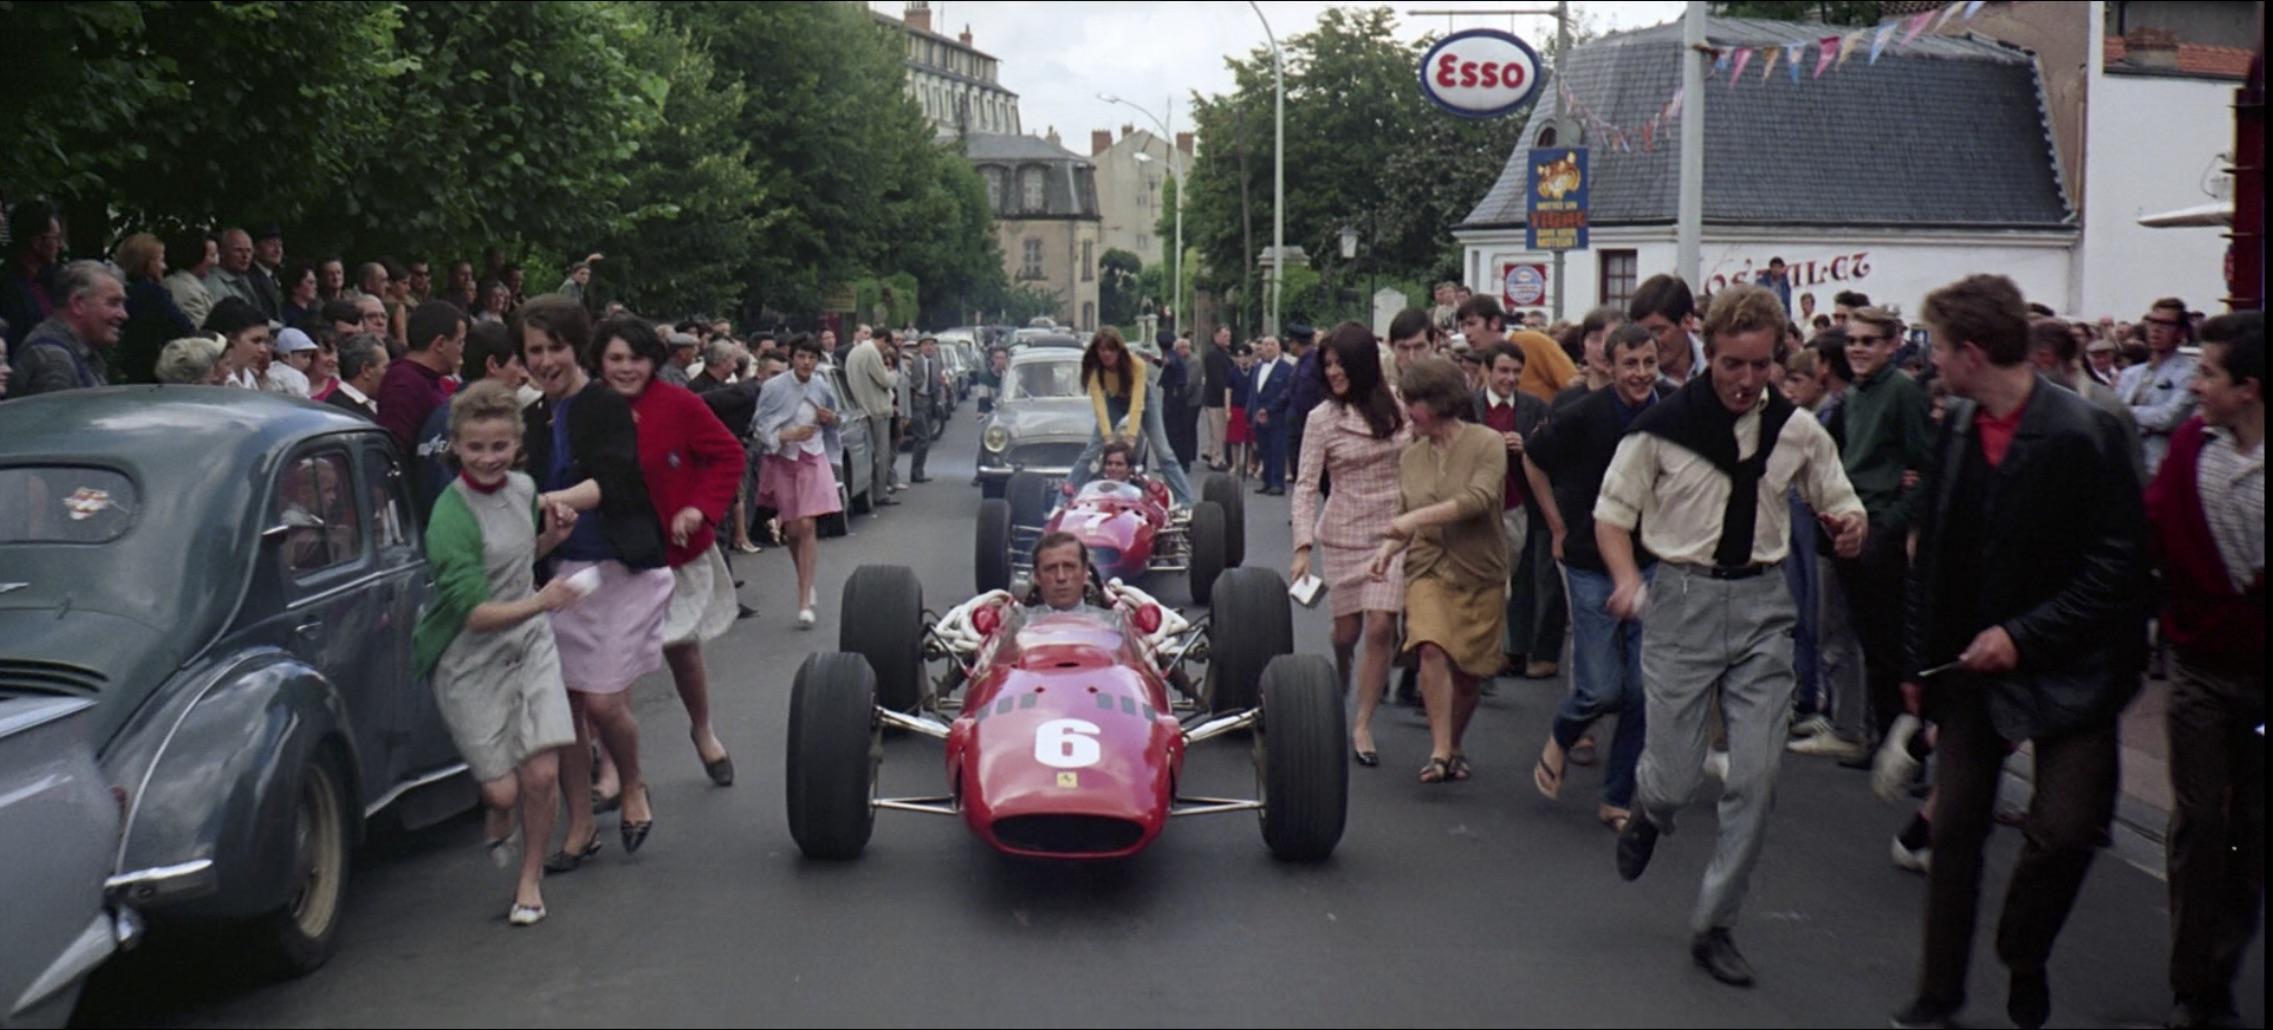 Grand Prix Ferrari race car on streets